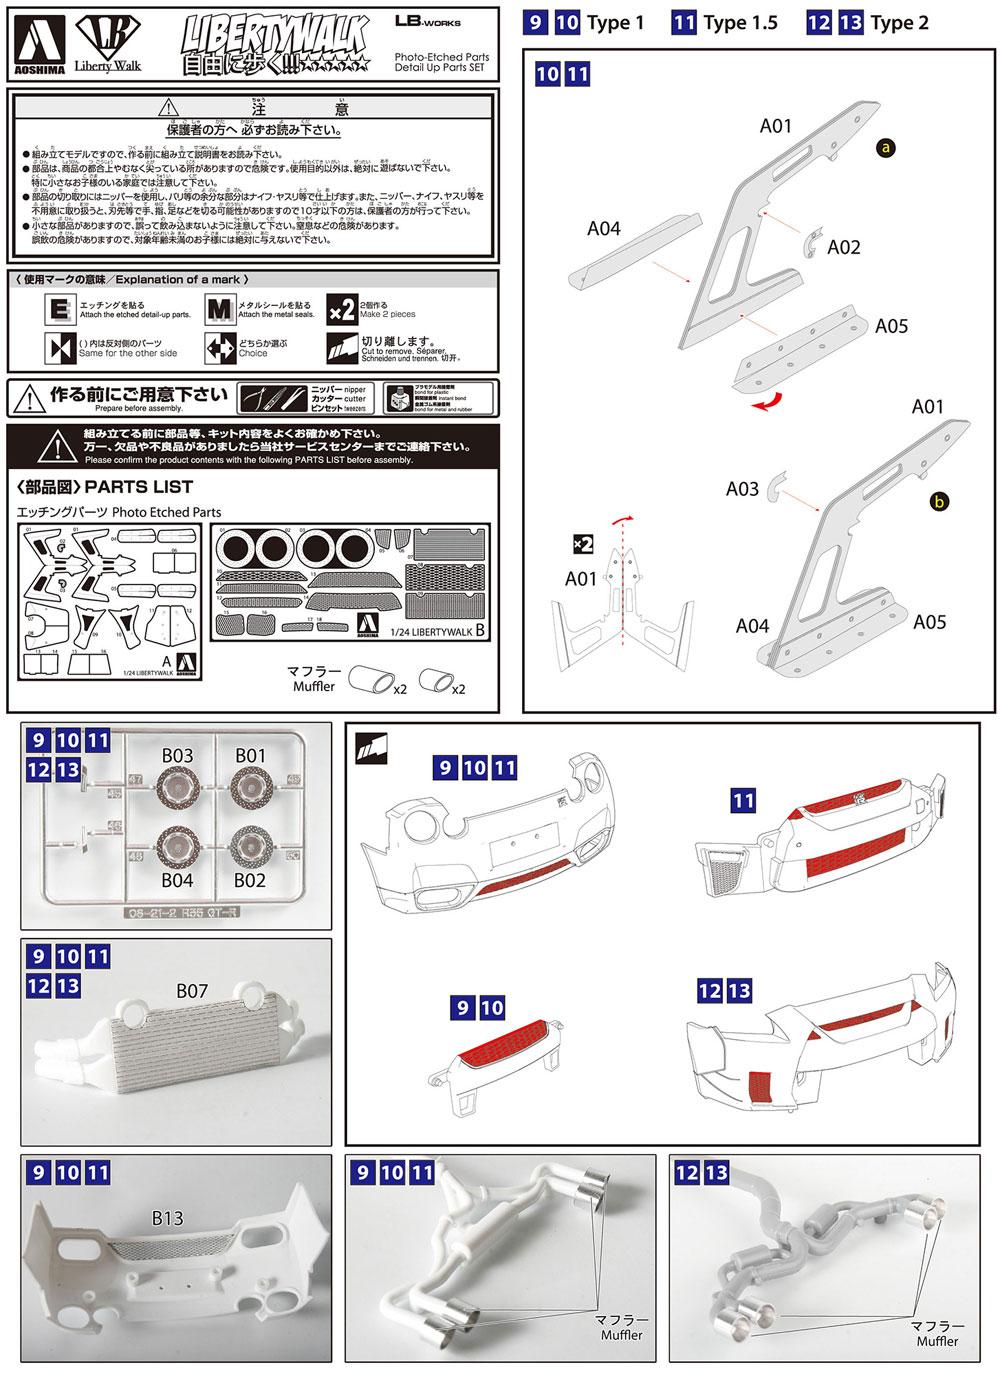 LBワークス R35 GT-R 共通ディテールアップパーツエッチング(アオシマ1/24 リバティウォーク ディテールアップパーツNo.056783)商品画像_2